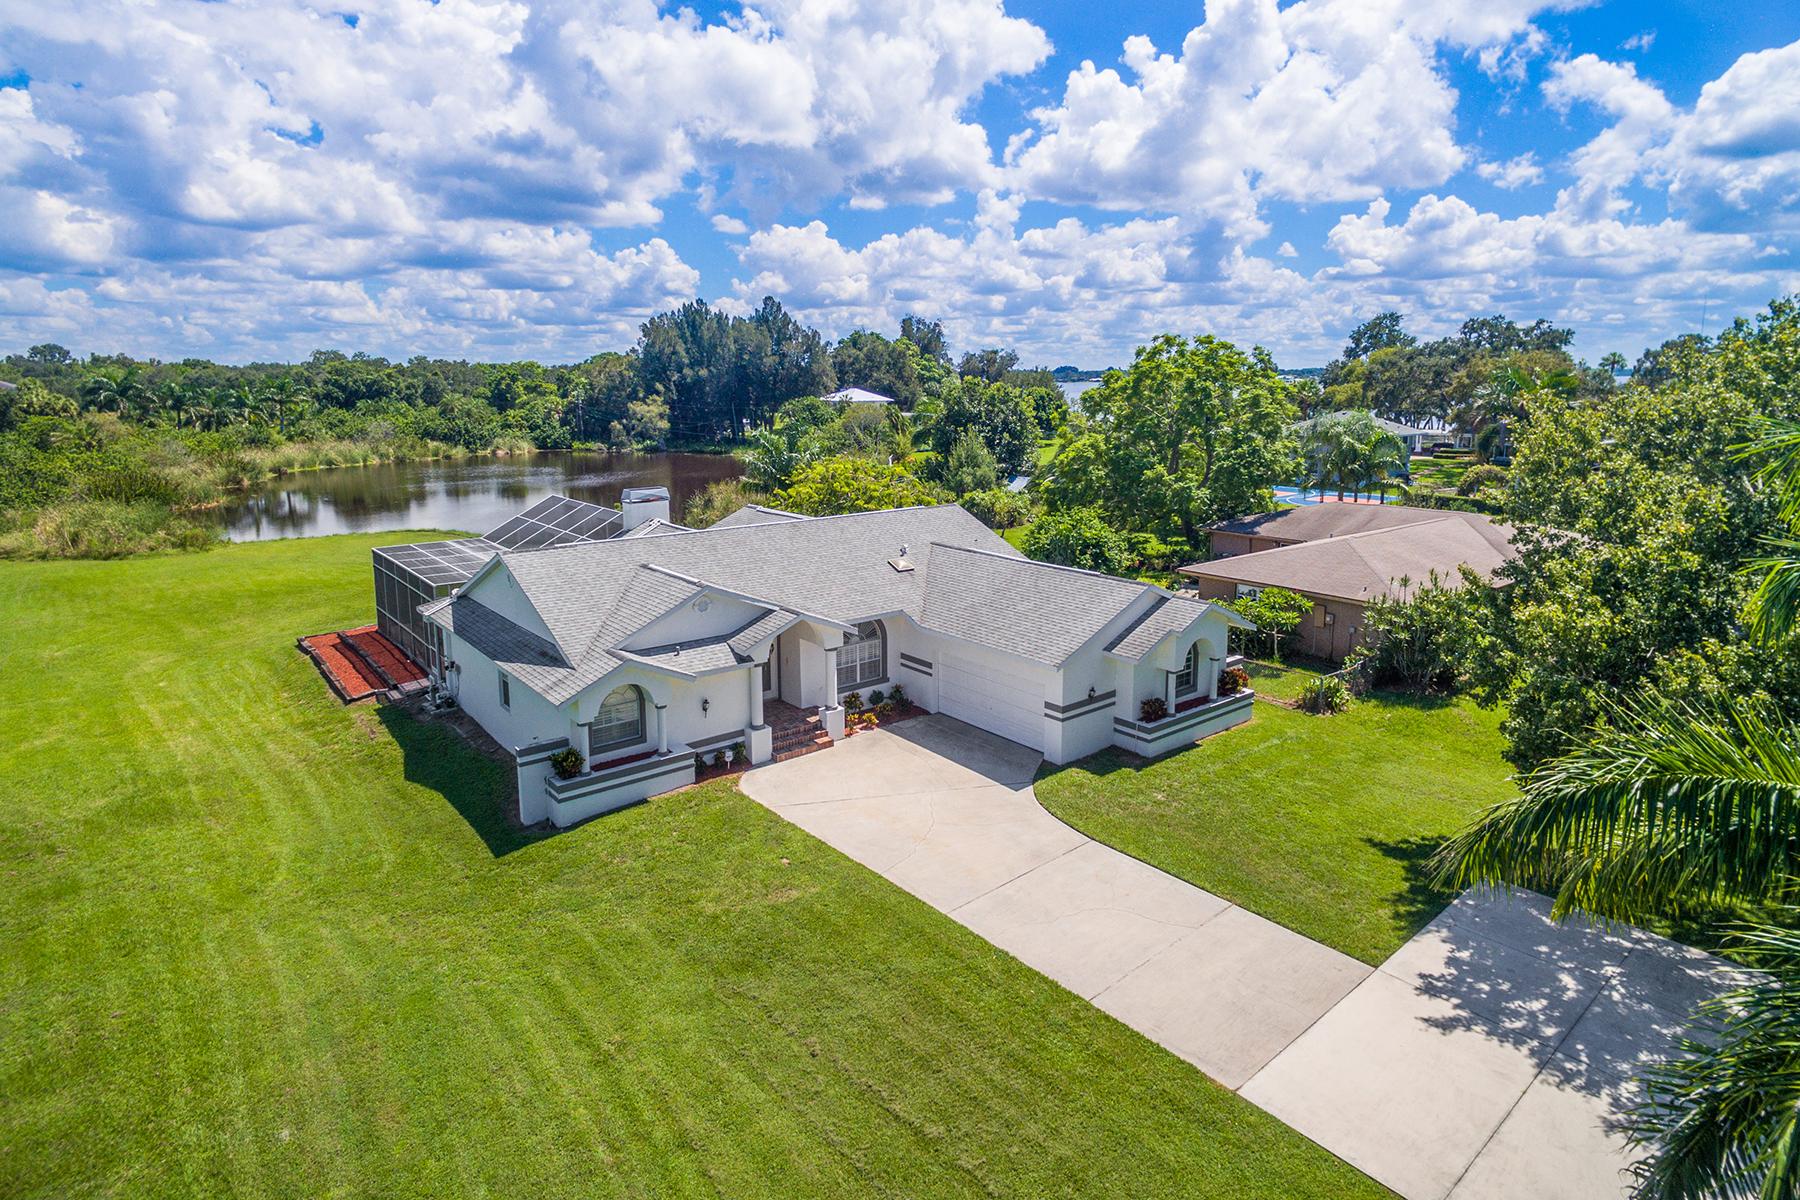 Single Family Home for Sale at TERRA CEIA 1476 Center Rd Terra Ceia, Florida, 34250 United States